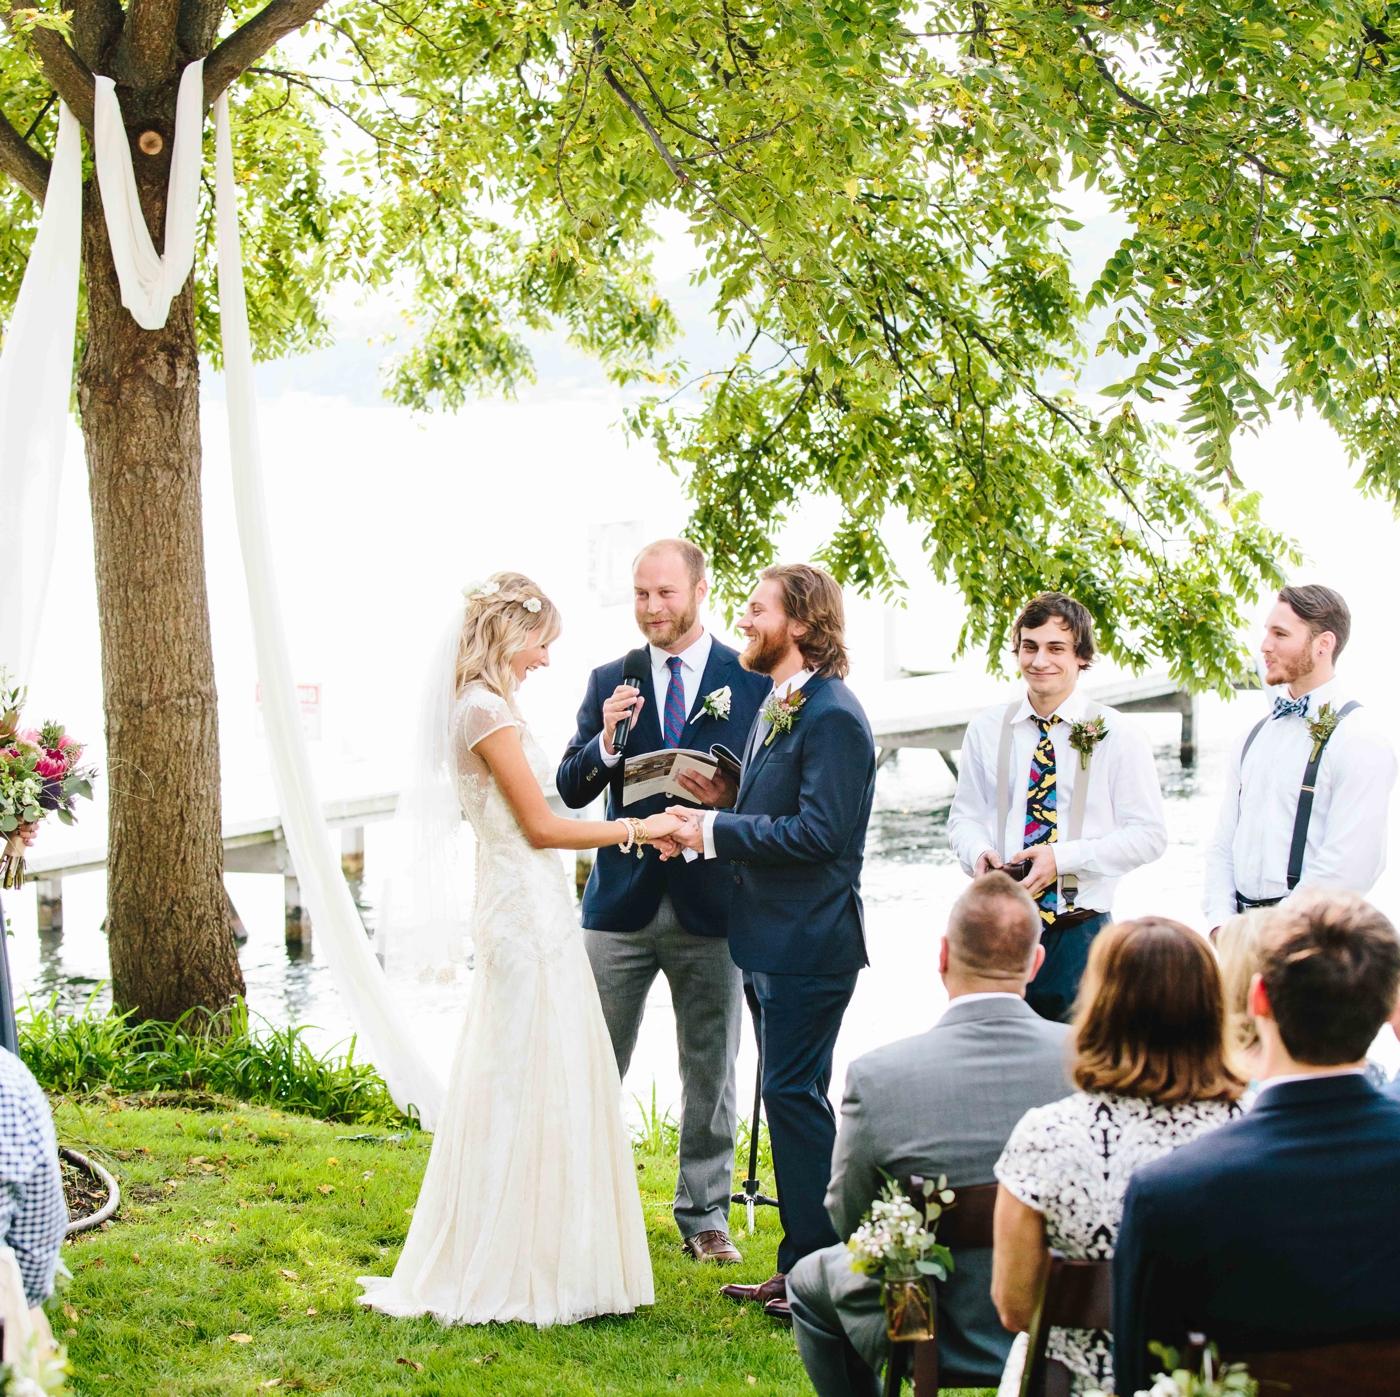 chicago-fine-art-wedding-photography-chriskelsey14